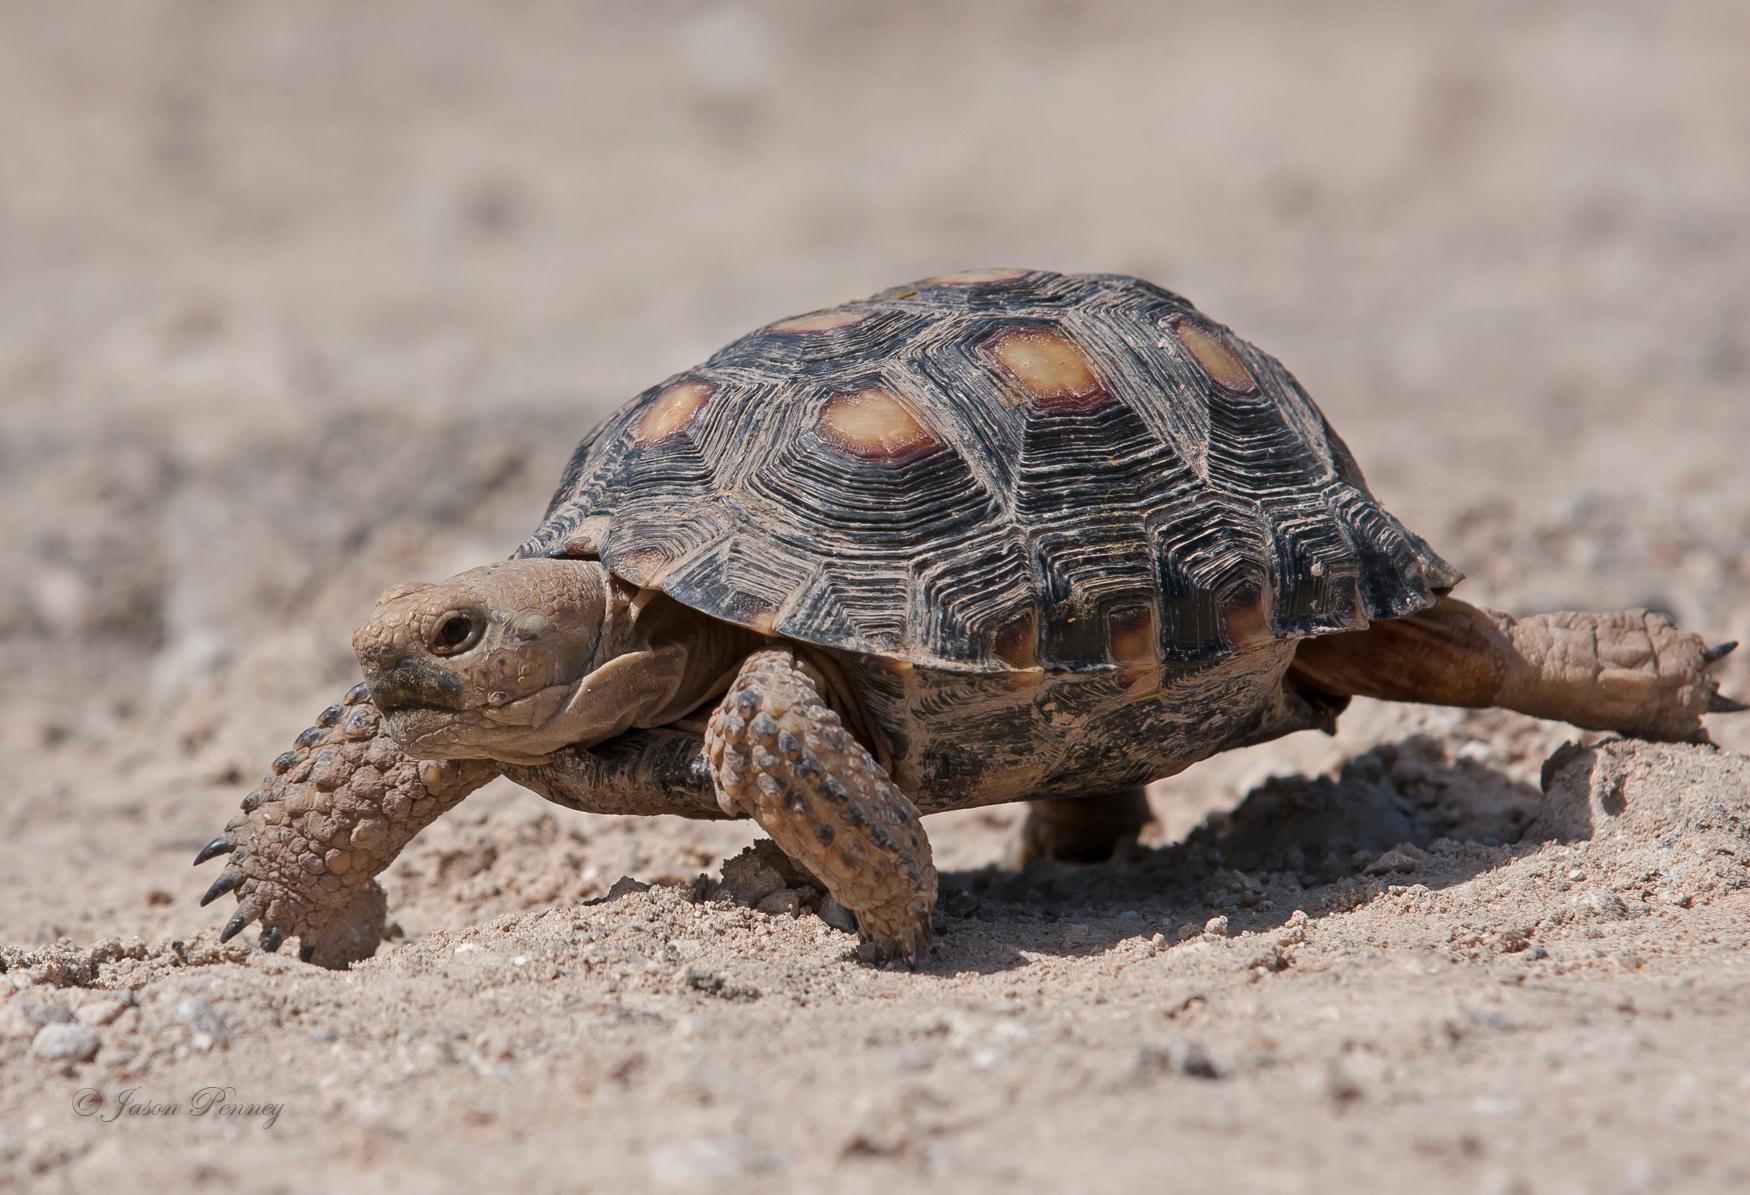 Tortuga del Desierto de Tamaulipas (Gopherus berlandieri) · NaturaLista